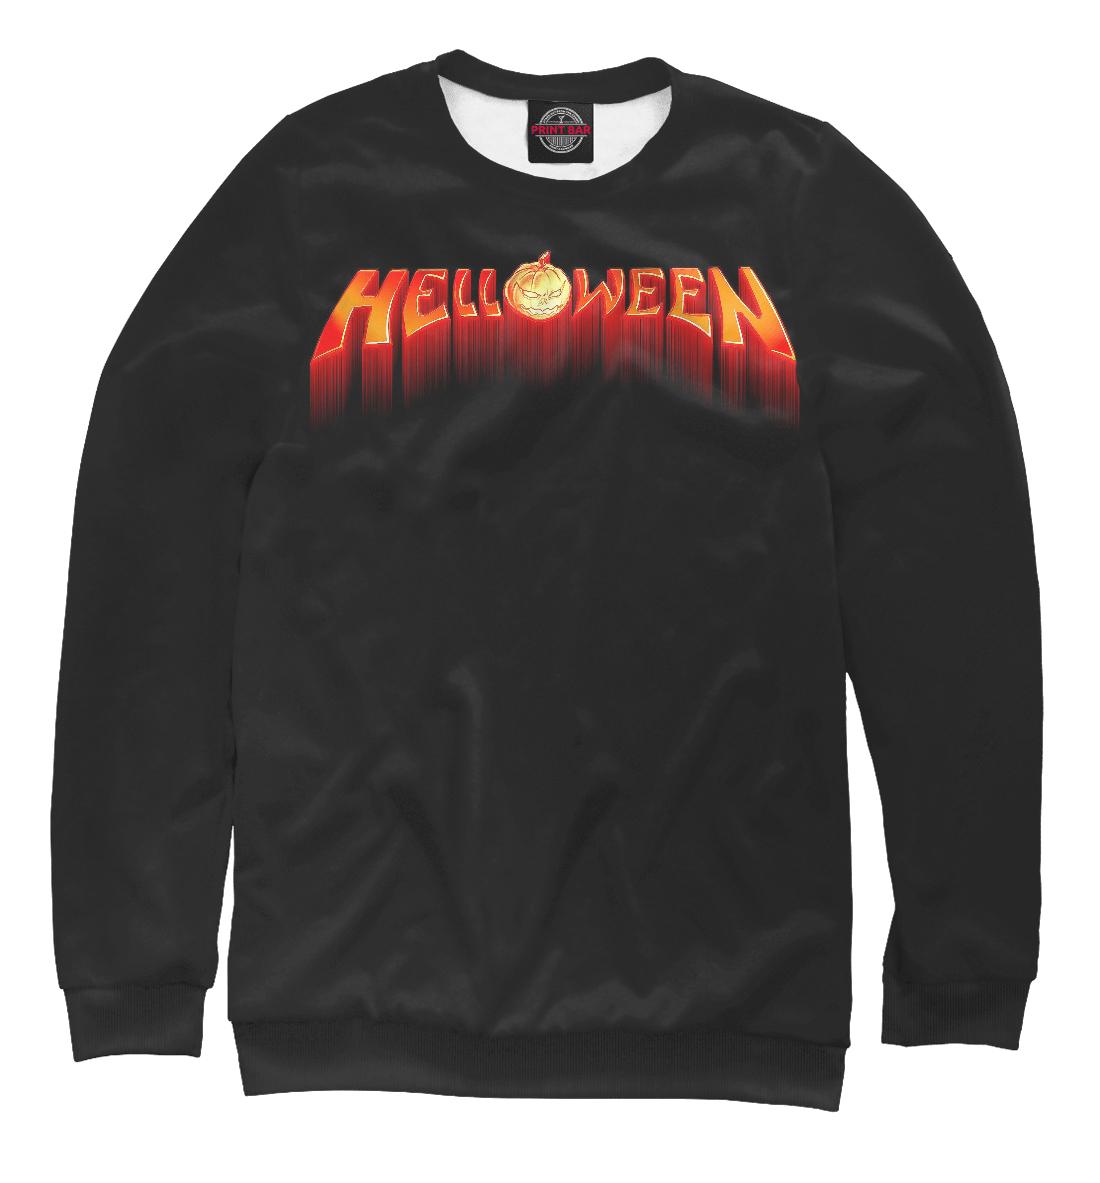 Купить Helloween, Printbar, Свитшоты, MZK-317323-swi-1